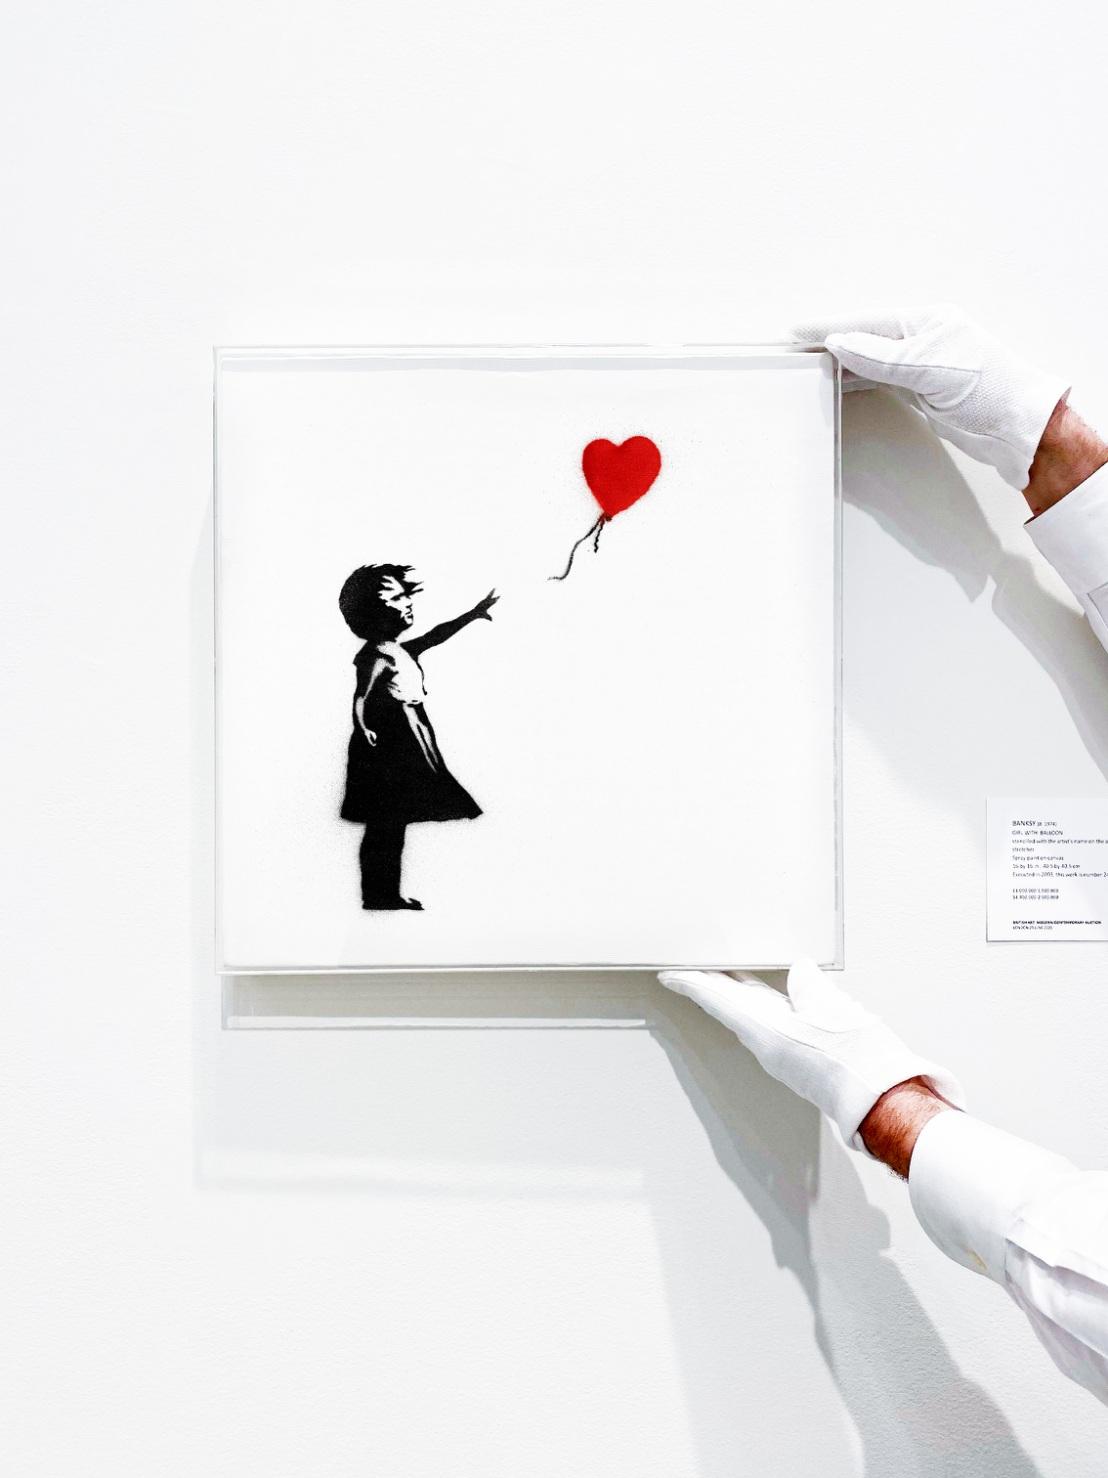 Lot 38- Banksy, Girl with Balloon, 2003,  (in situ 3).jpg